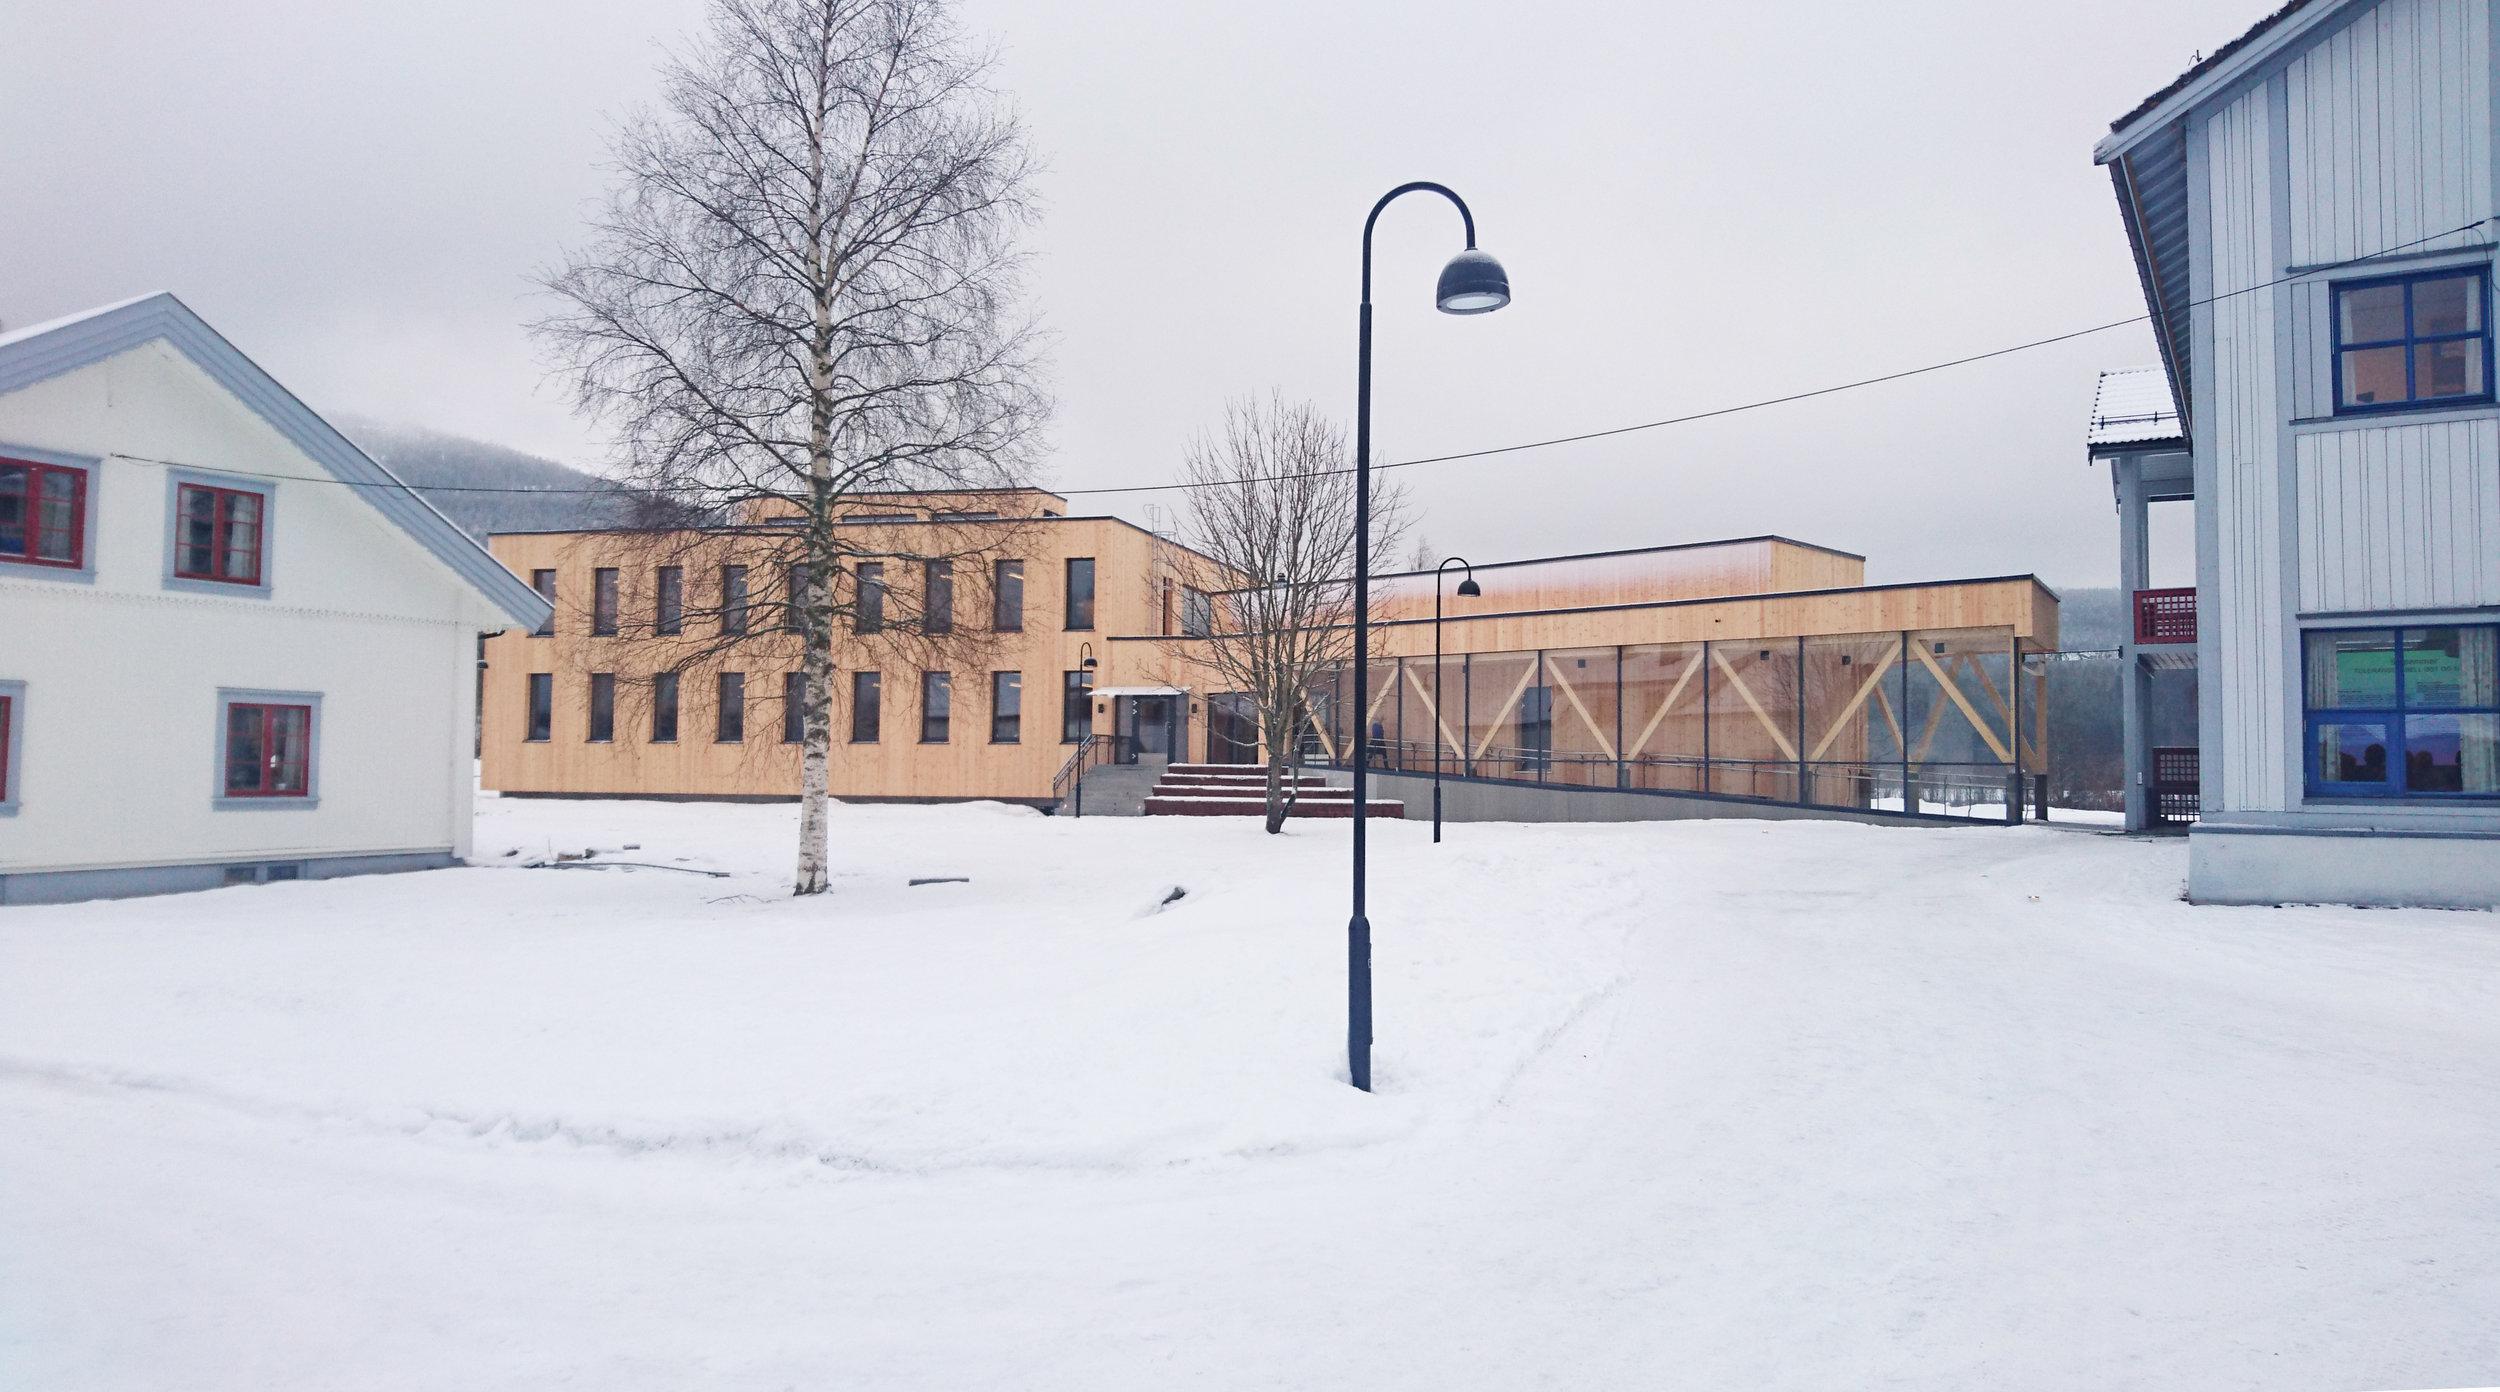 Evenstad Skole